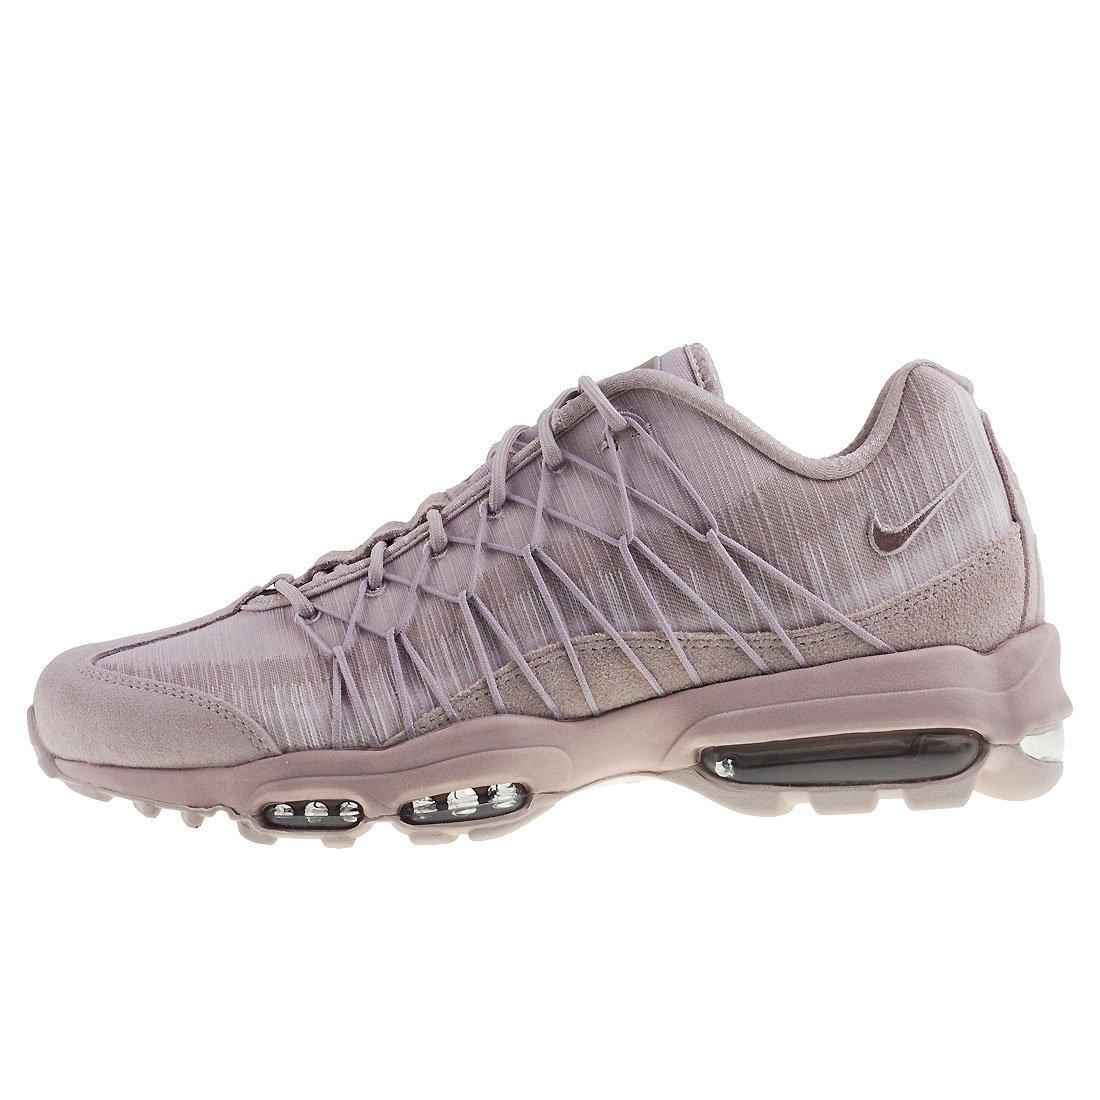 3e0dfeccc6 Nike Men's Air Max 95 Ultra JCRD Running Shoes: Amazon.co.uk: Shoes & Bags